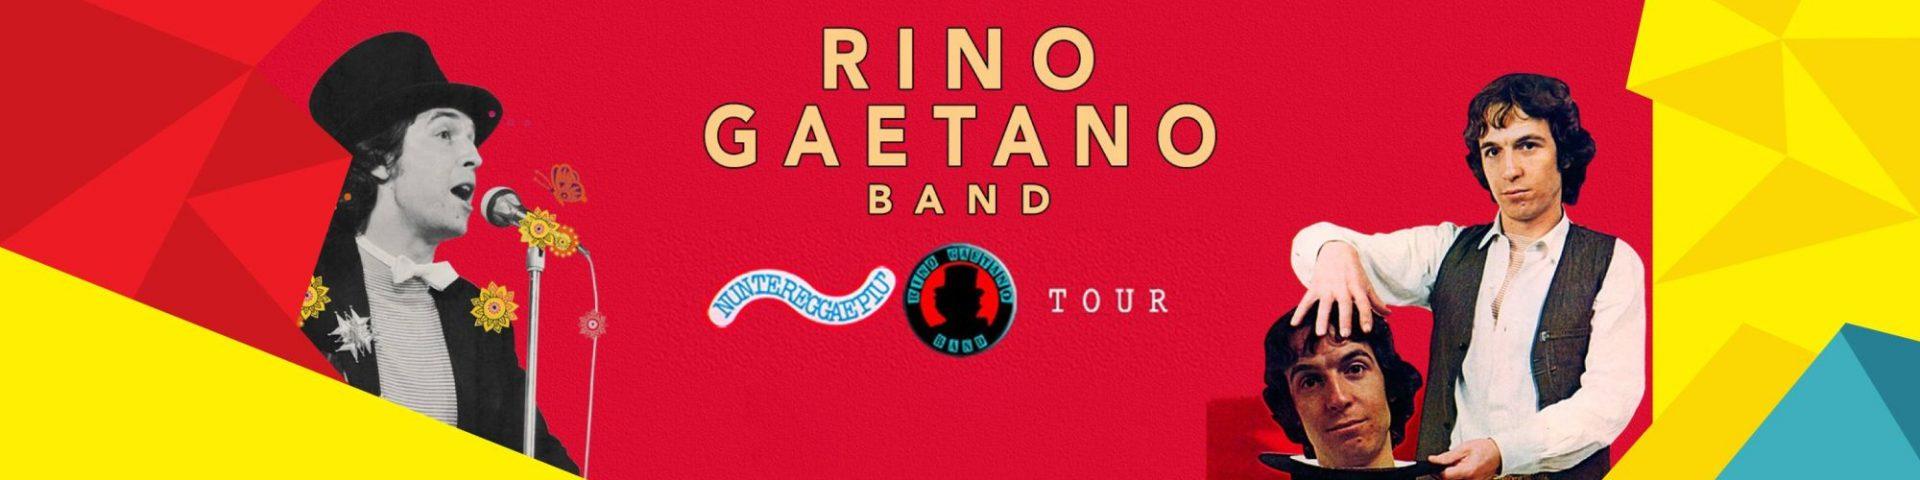 Rino Gaetano Band a Castelfranco Veneto – 31/10